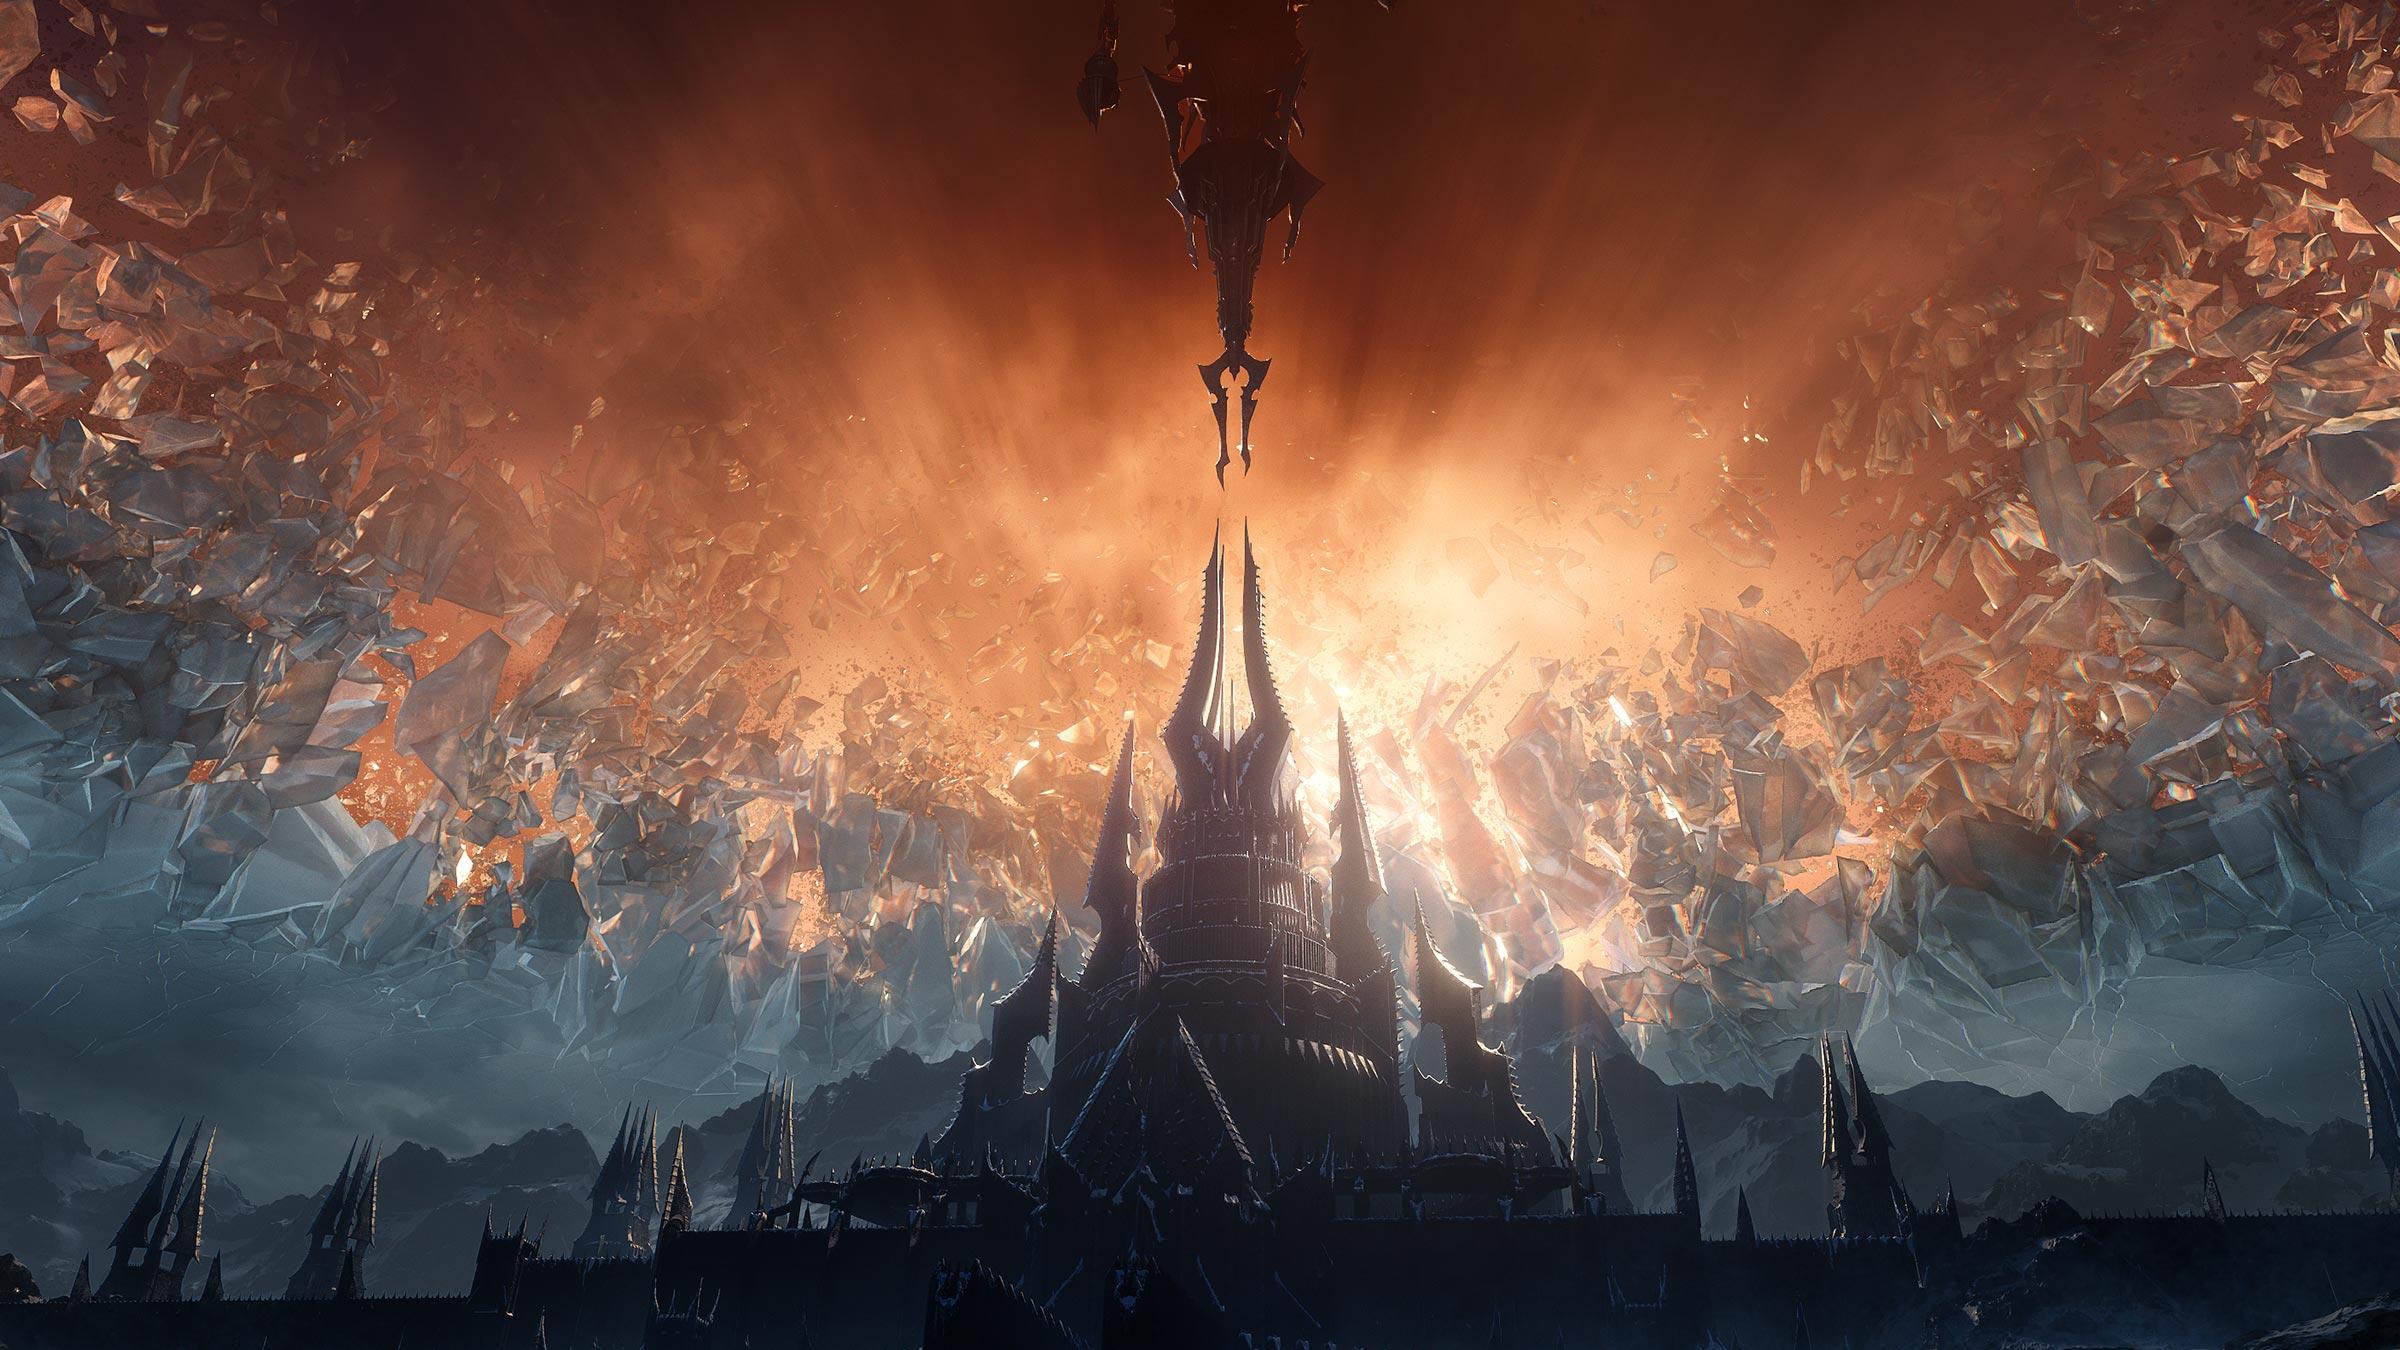 General 2400x1350 World of Warcraft Blizzard Entertainment CG cinematic World of Warcraft: Shadowlands Warcraft